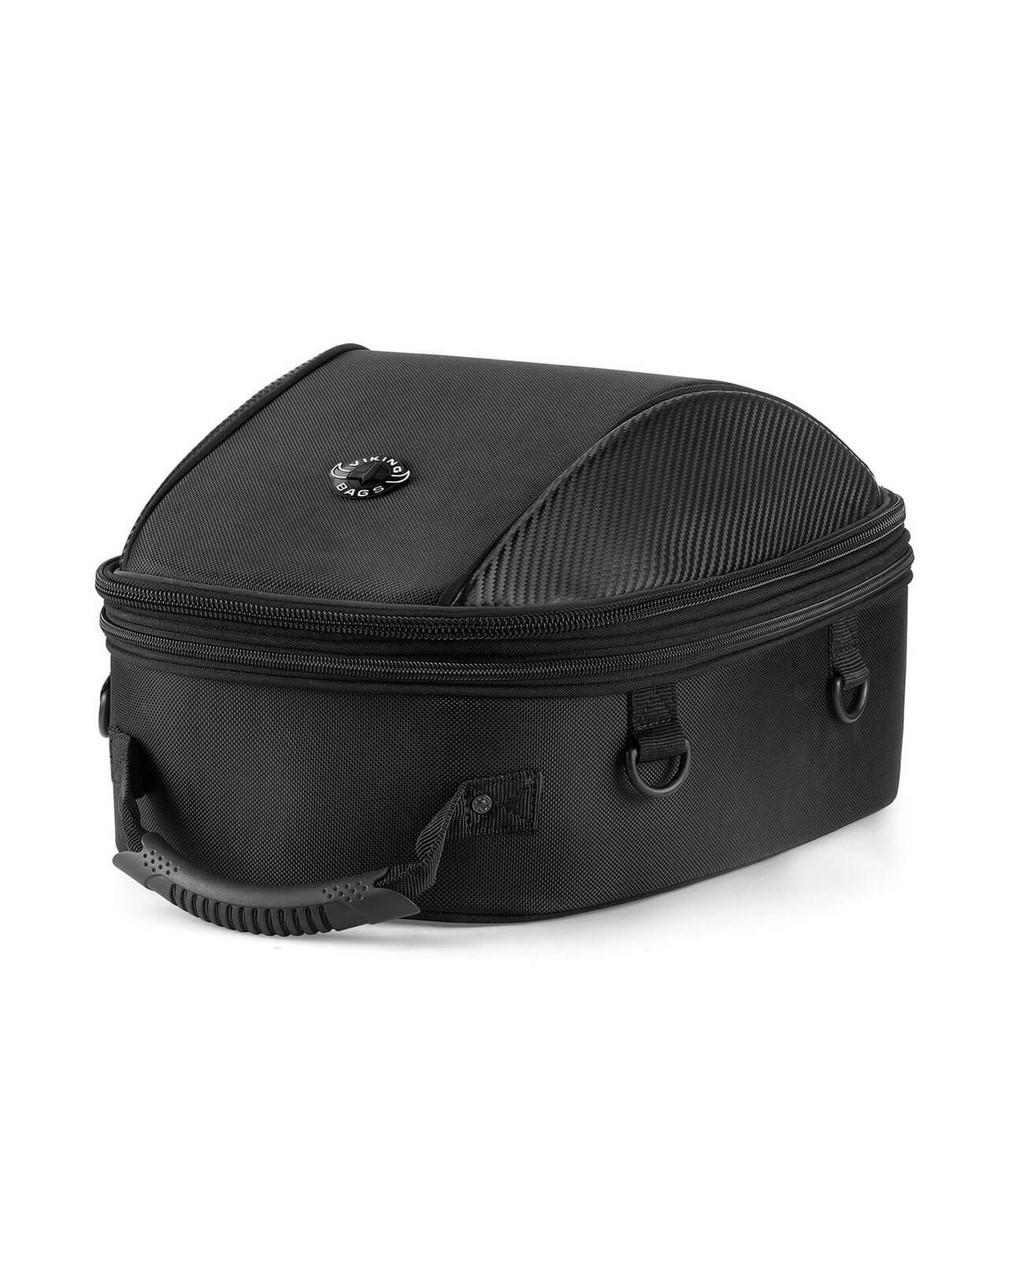 Kawasaki Viking Medium Black Tail Bag Main Bag View